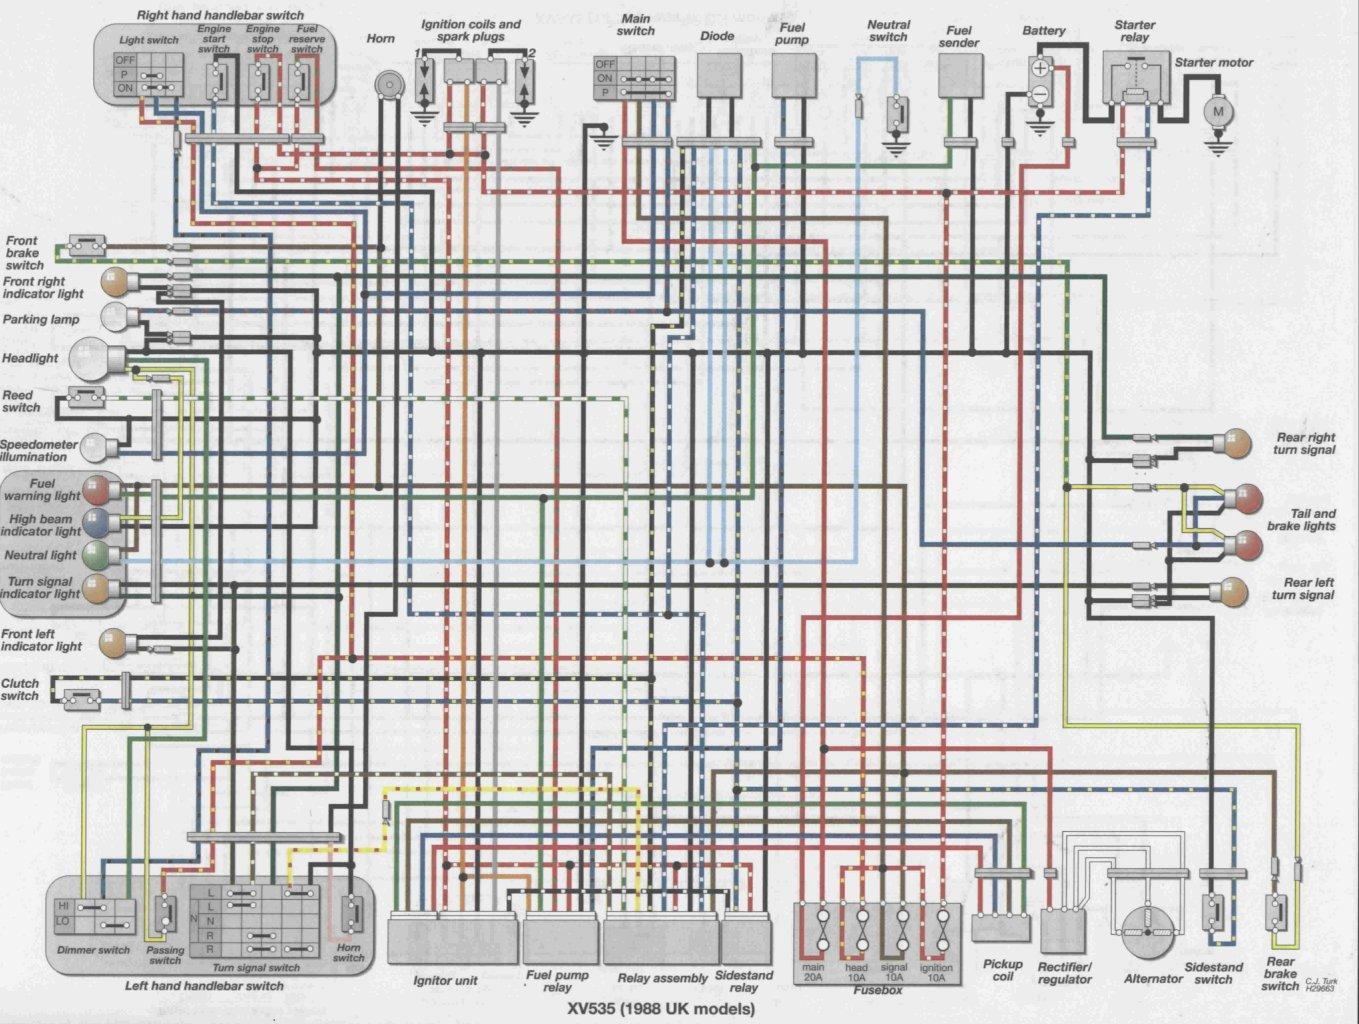 hight resolution of  1995 yamaha virago 750 wiring diagram index of wiring